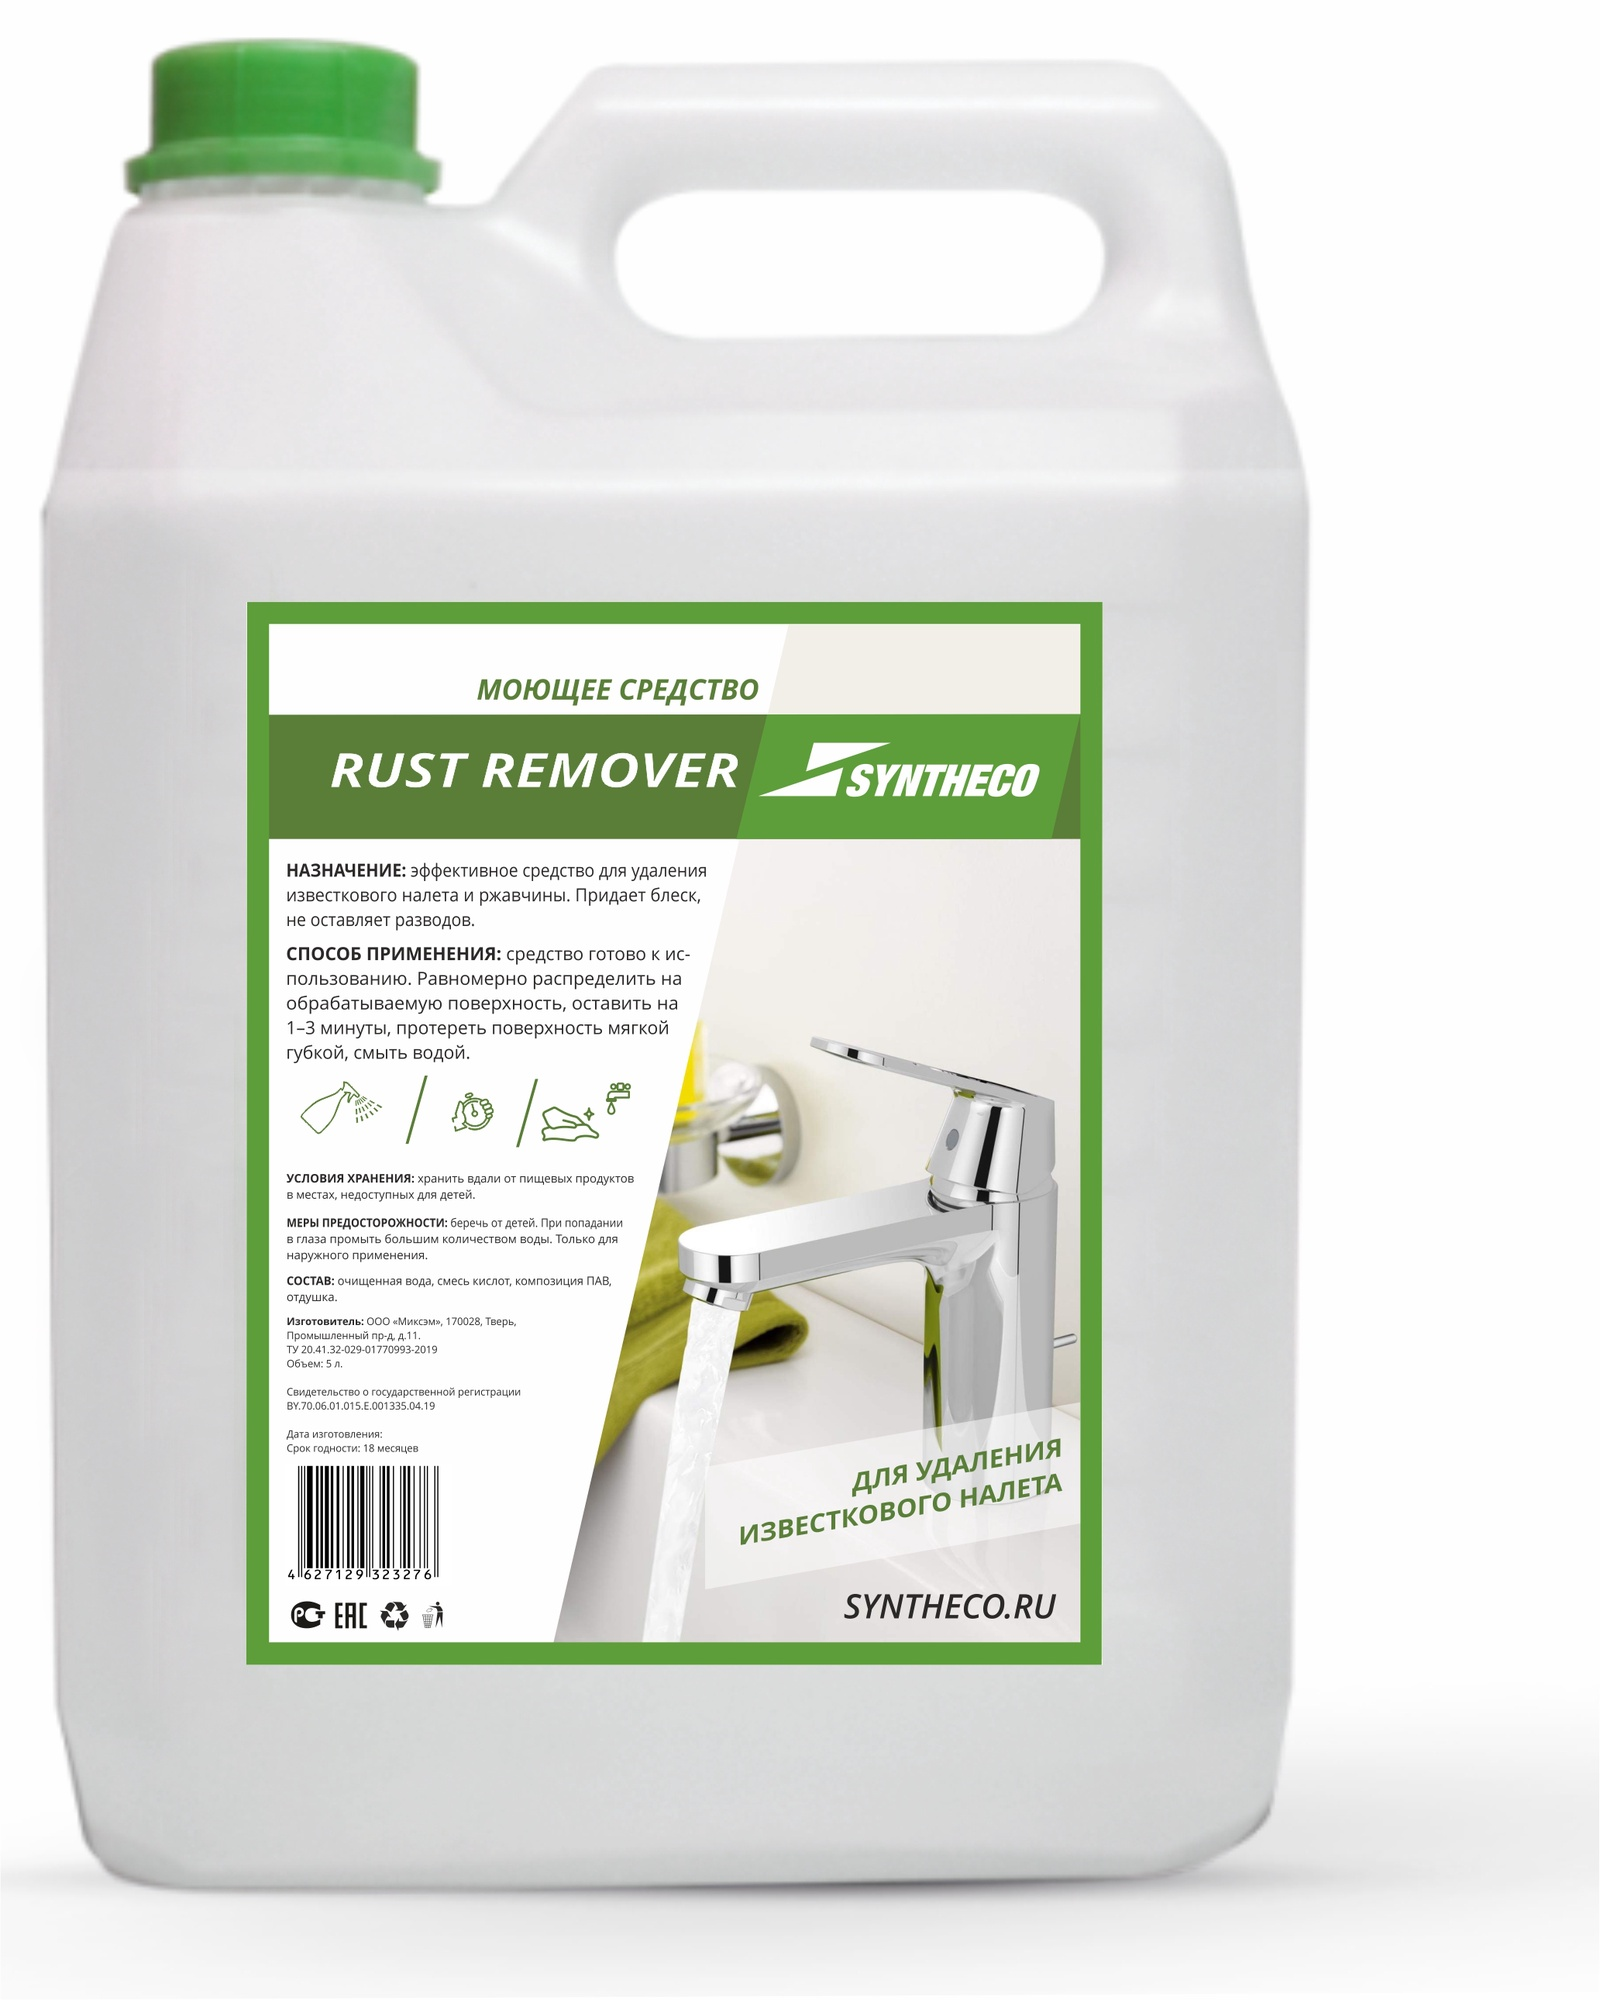 Syntheco Средство моющее Rust remover, 5 кг